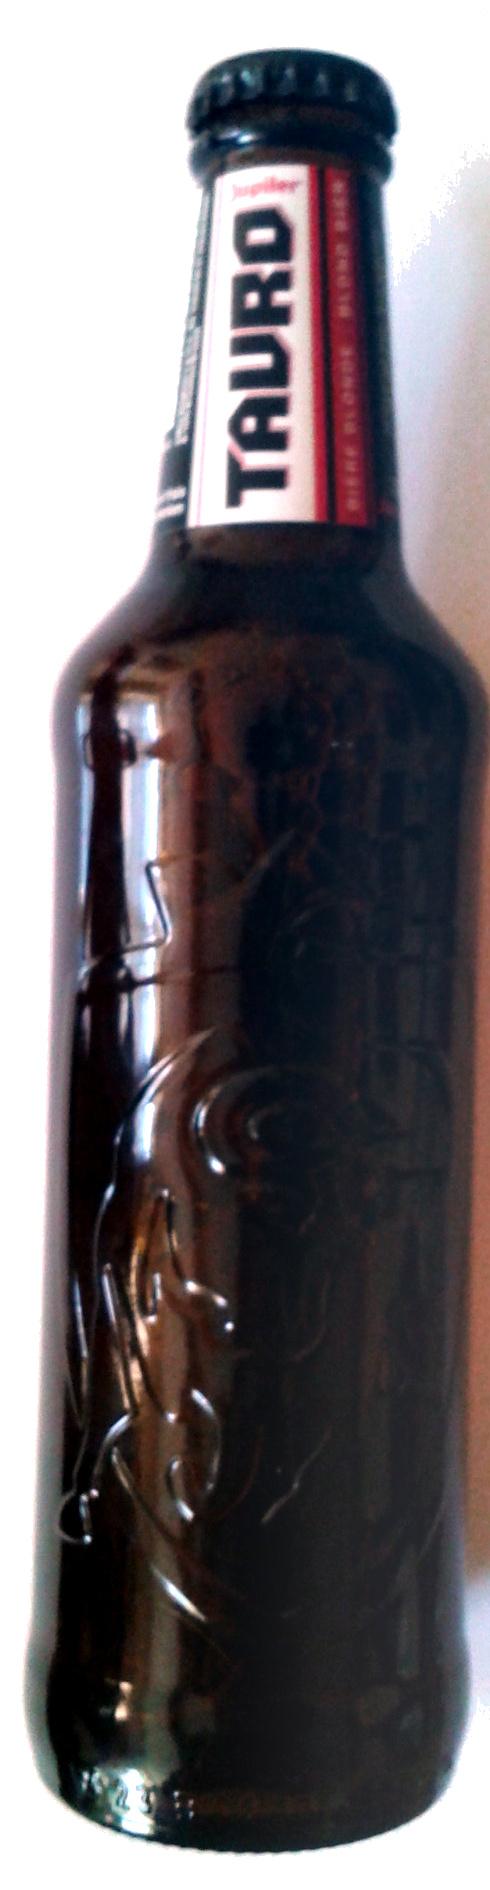 Bière Tauro - Produit